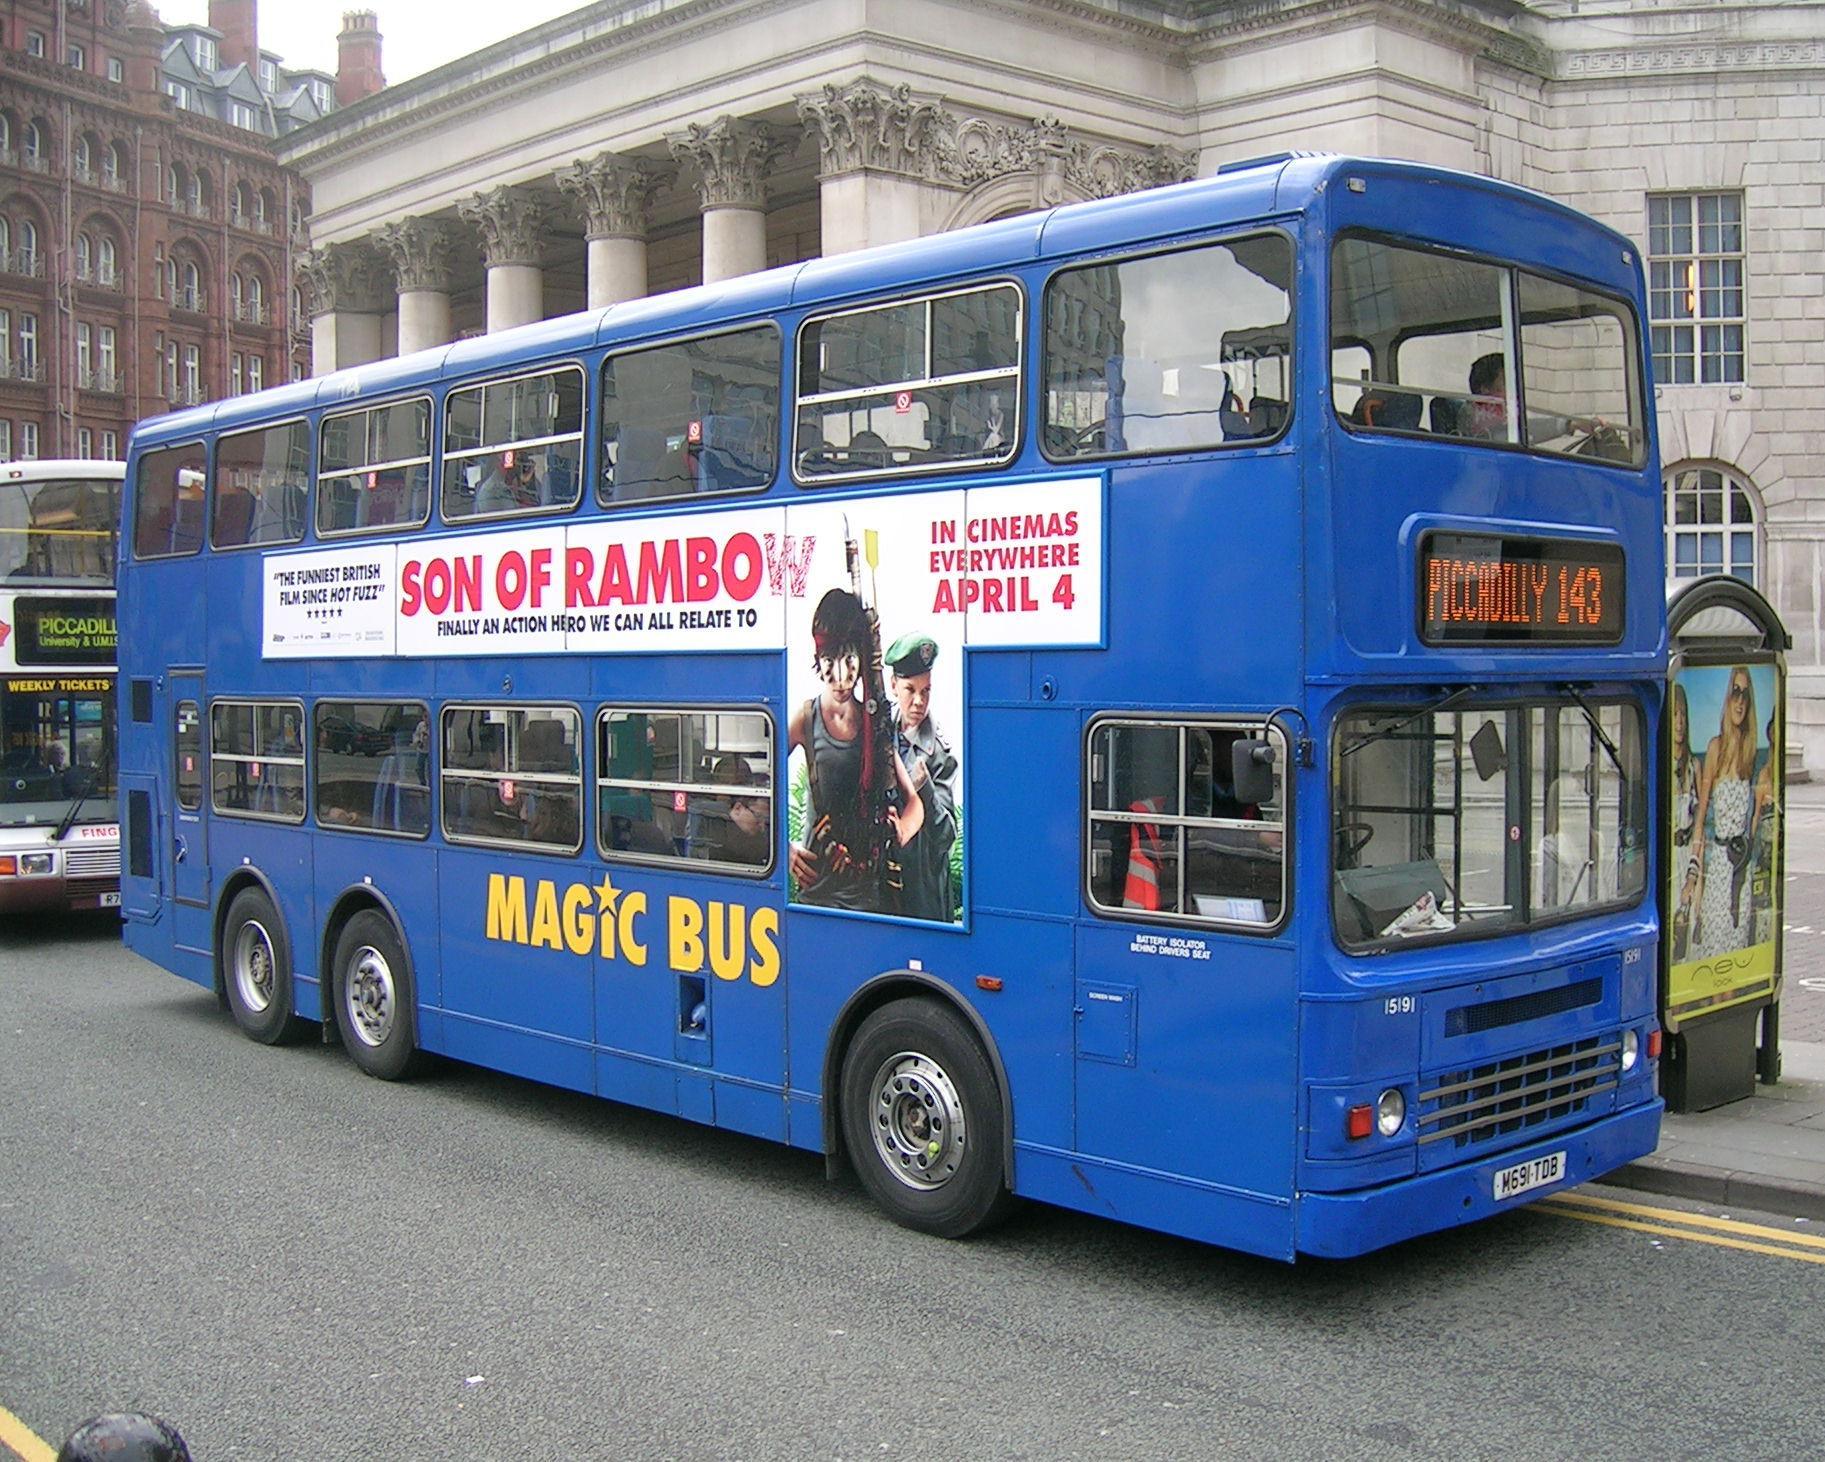 FileStagecoach Magic Bus M691TDBjpg Wikimedia Commons